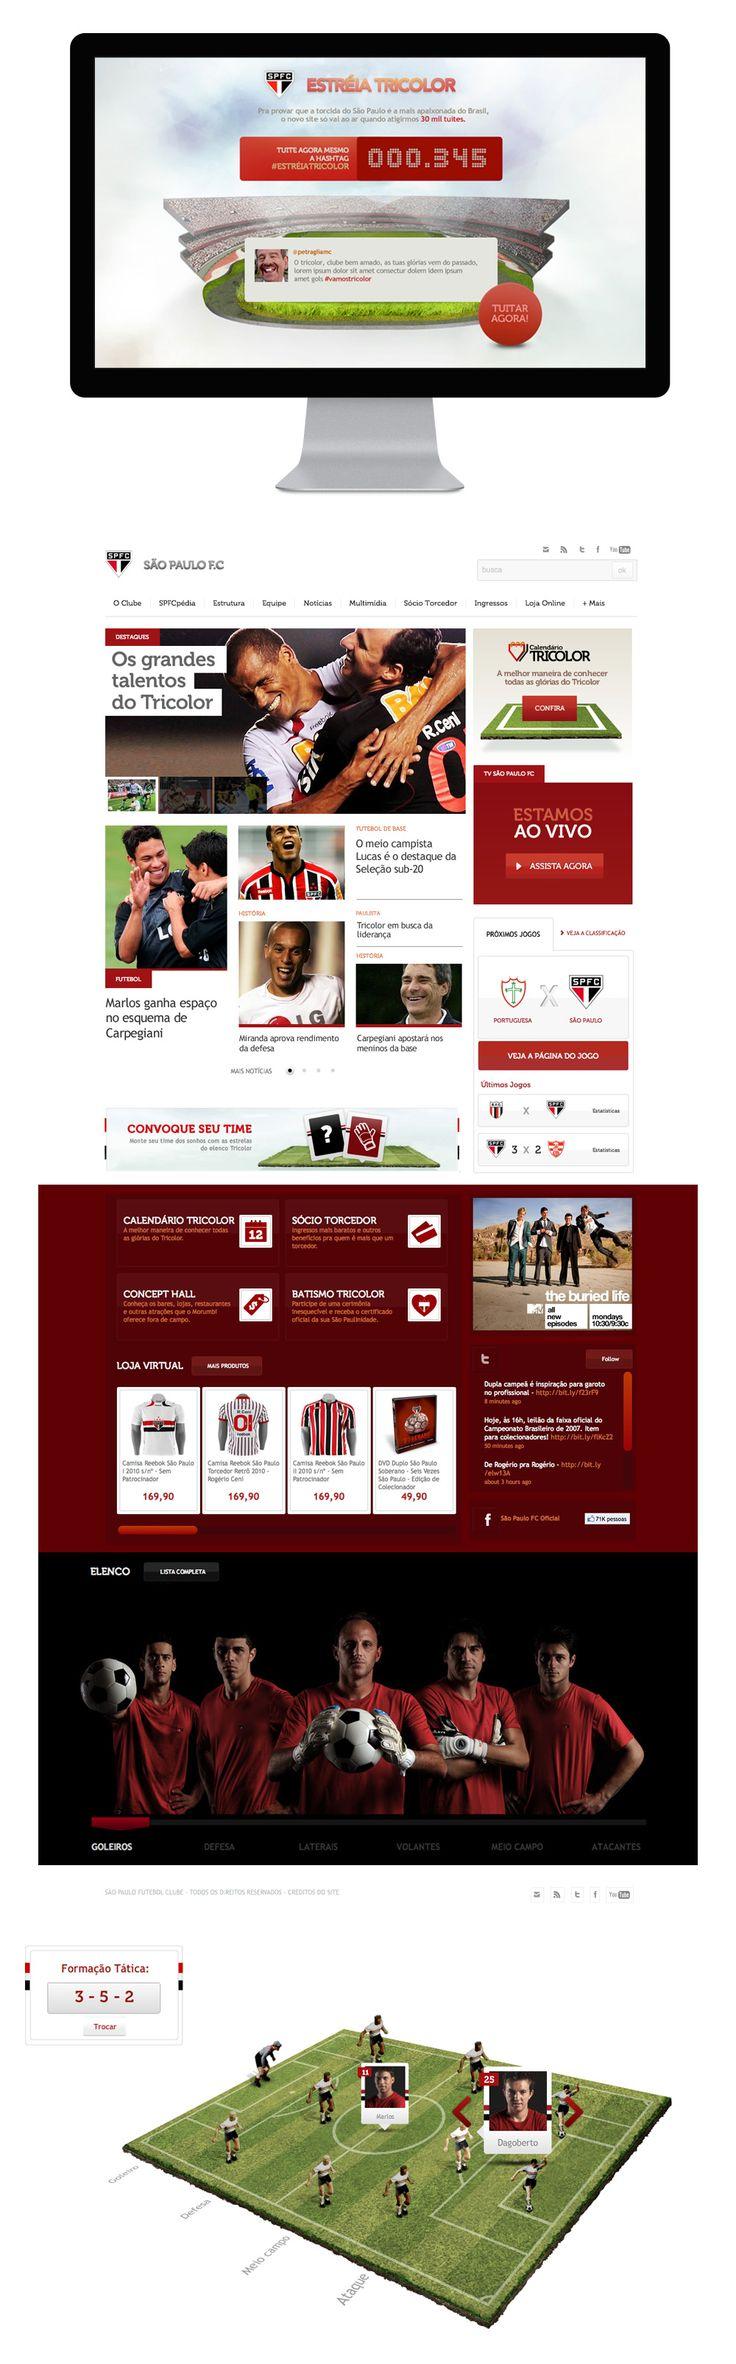 SPFC Official website.